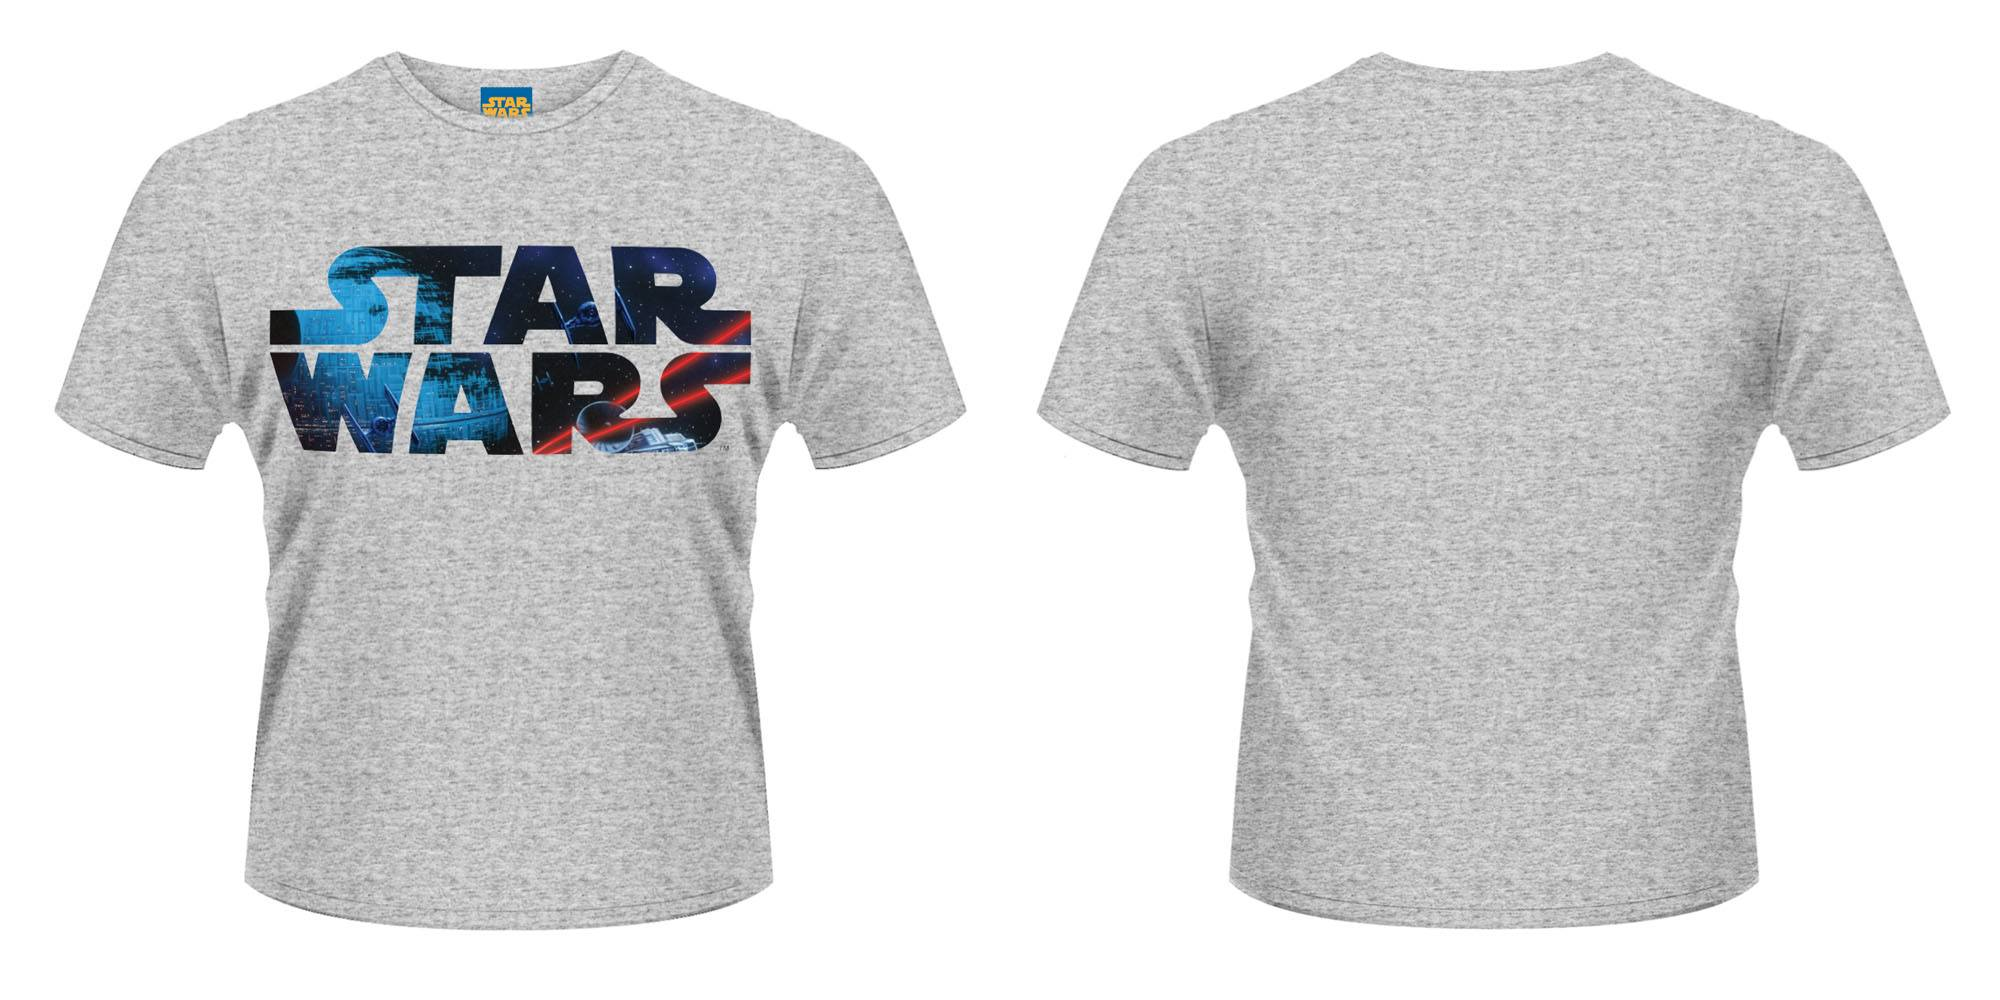 Star Wars T-Shirt Space Logo Size XL